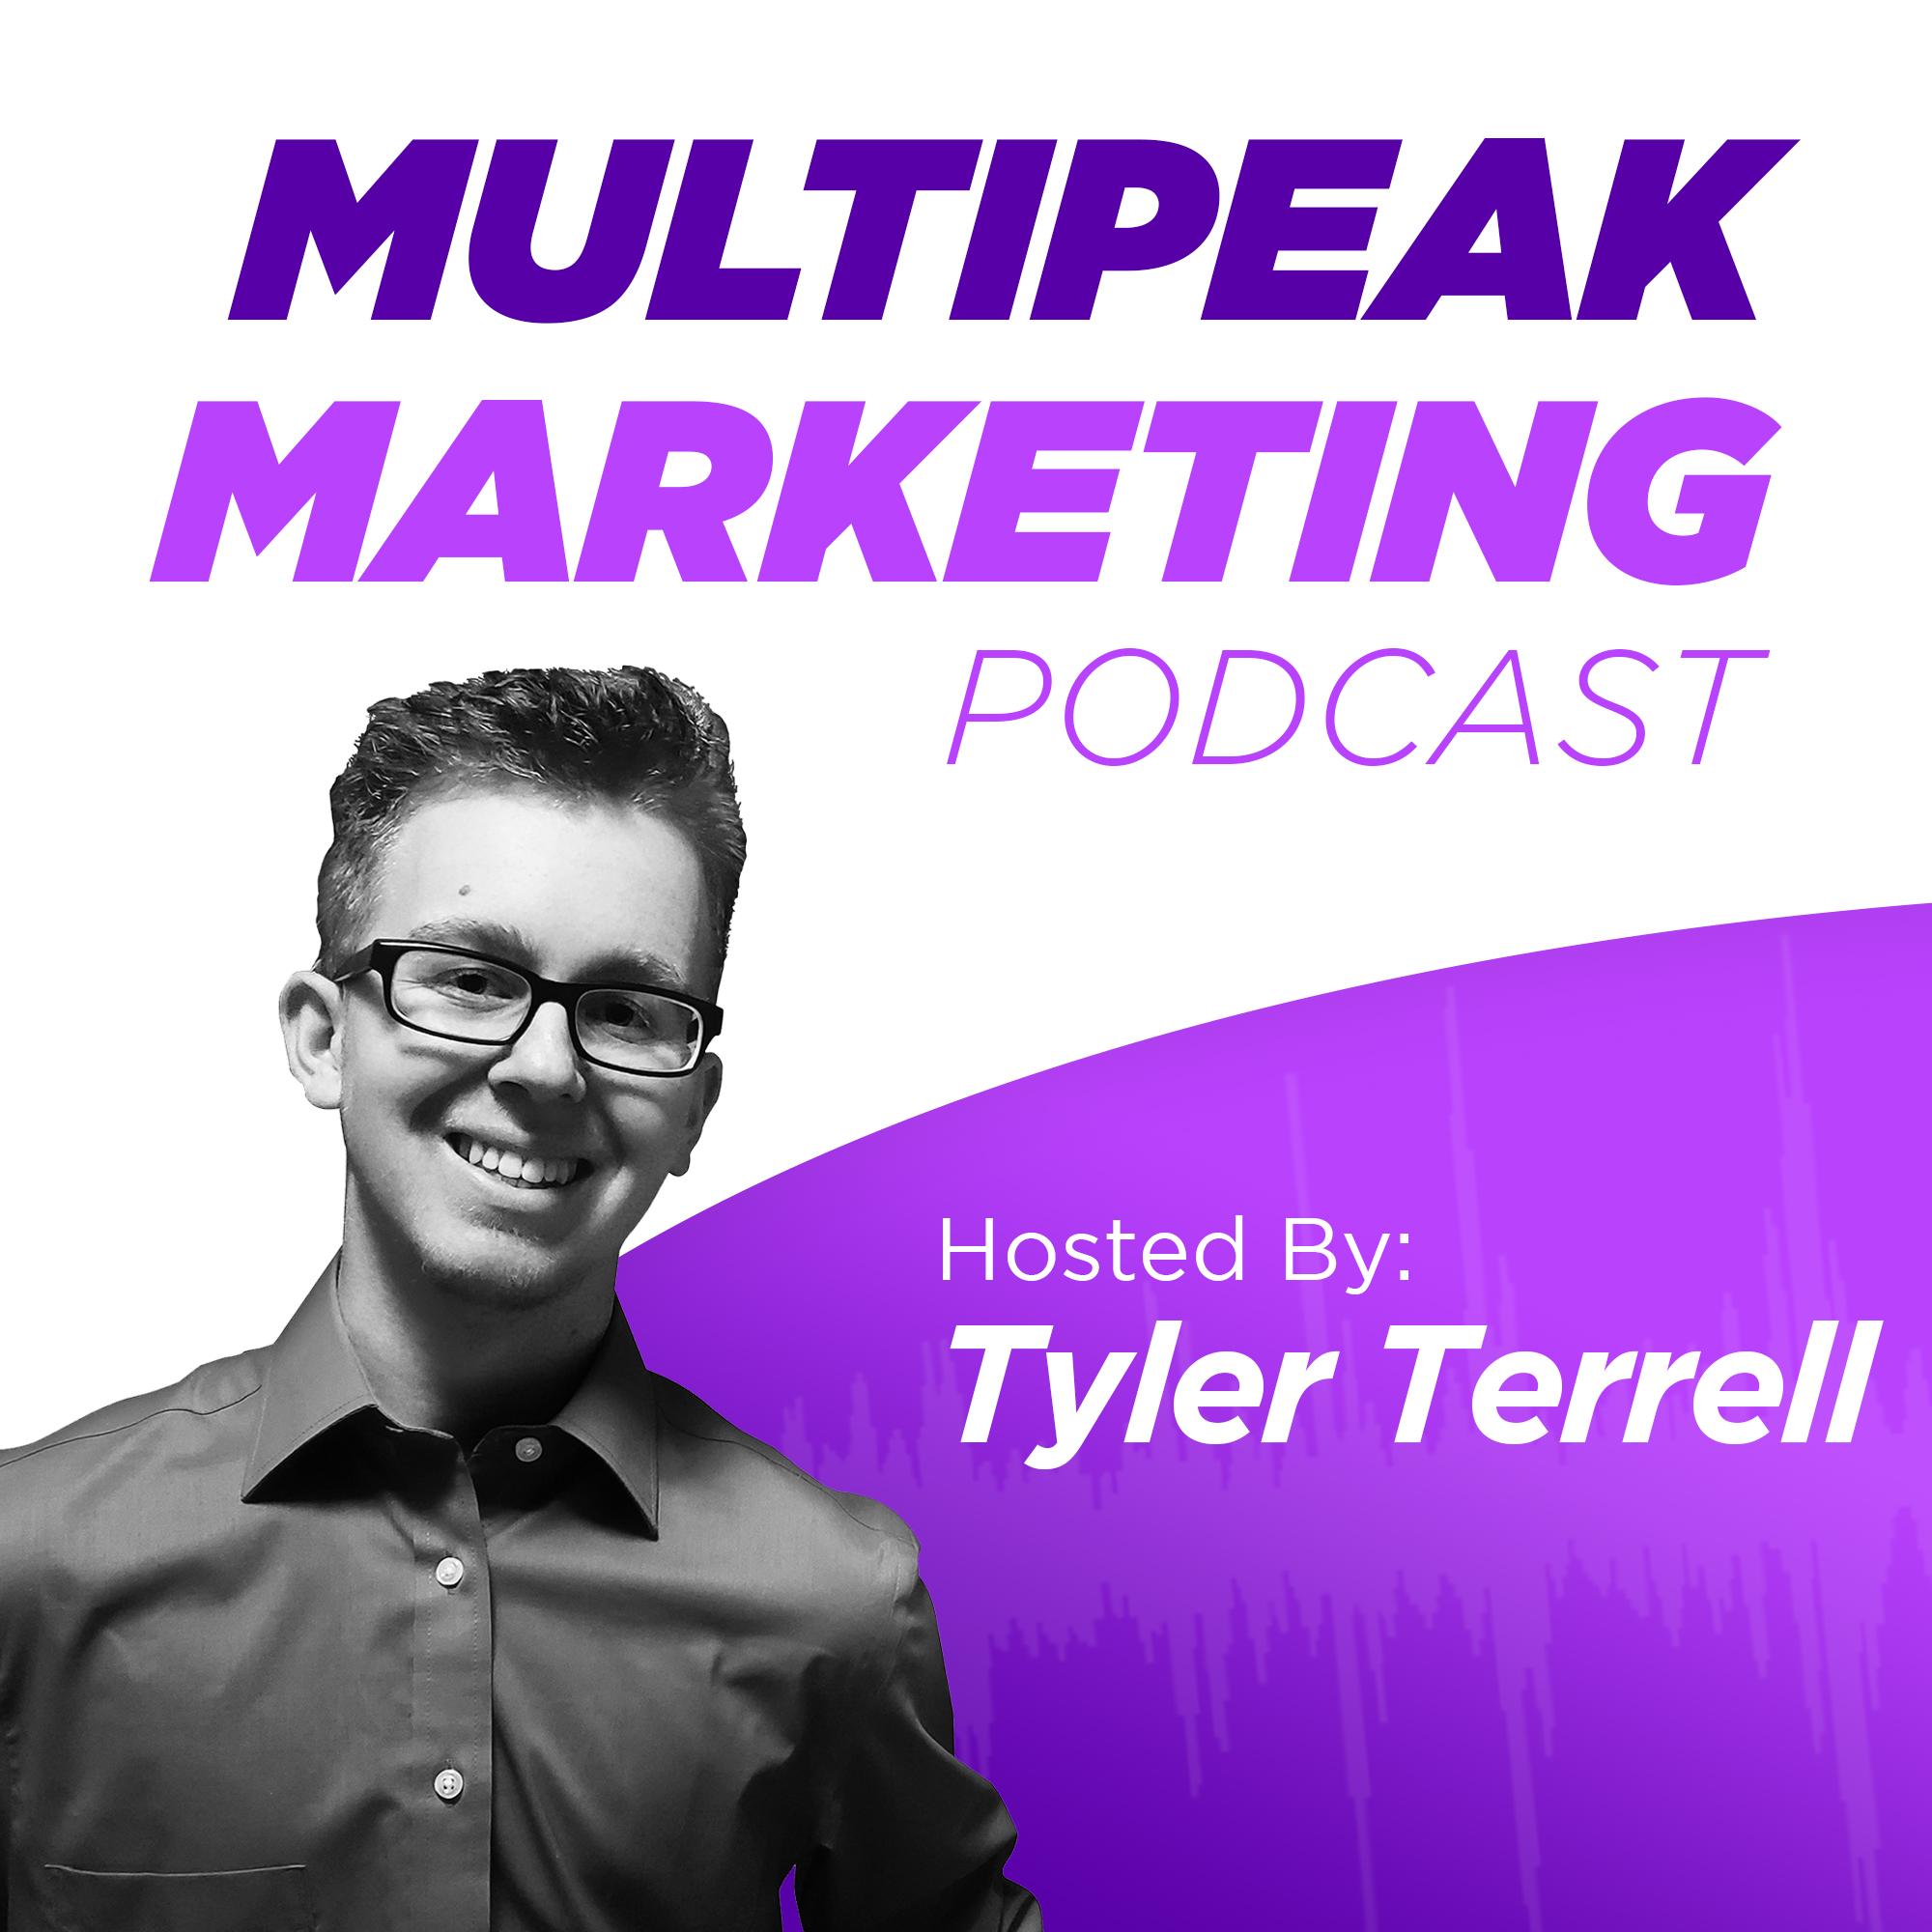 Dr. Eric Sacks - Multipeak Marketing Podcast - Episode 4 show art